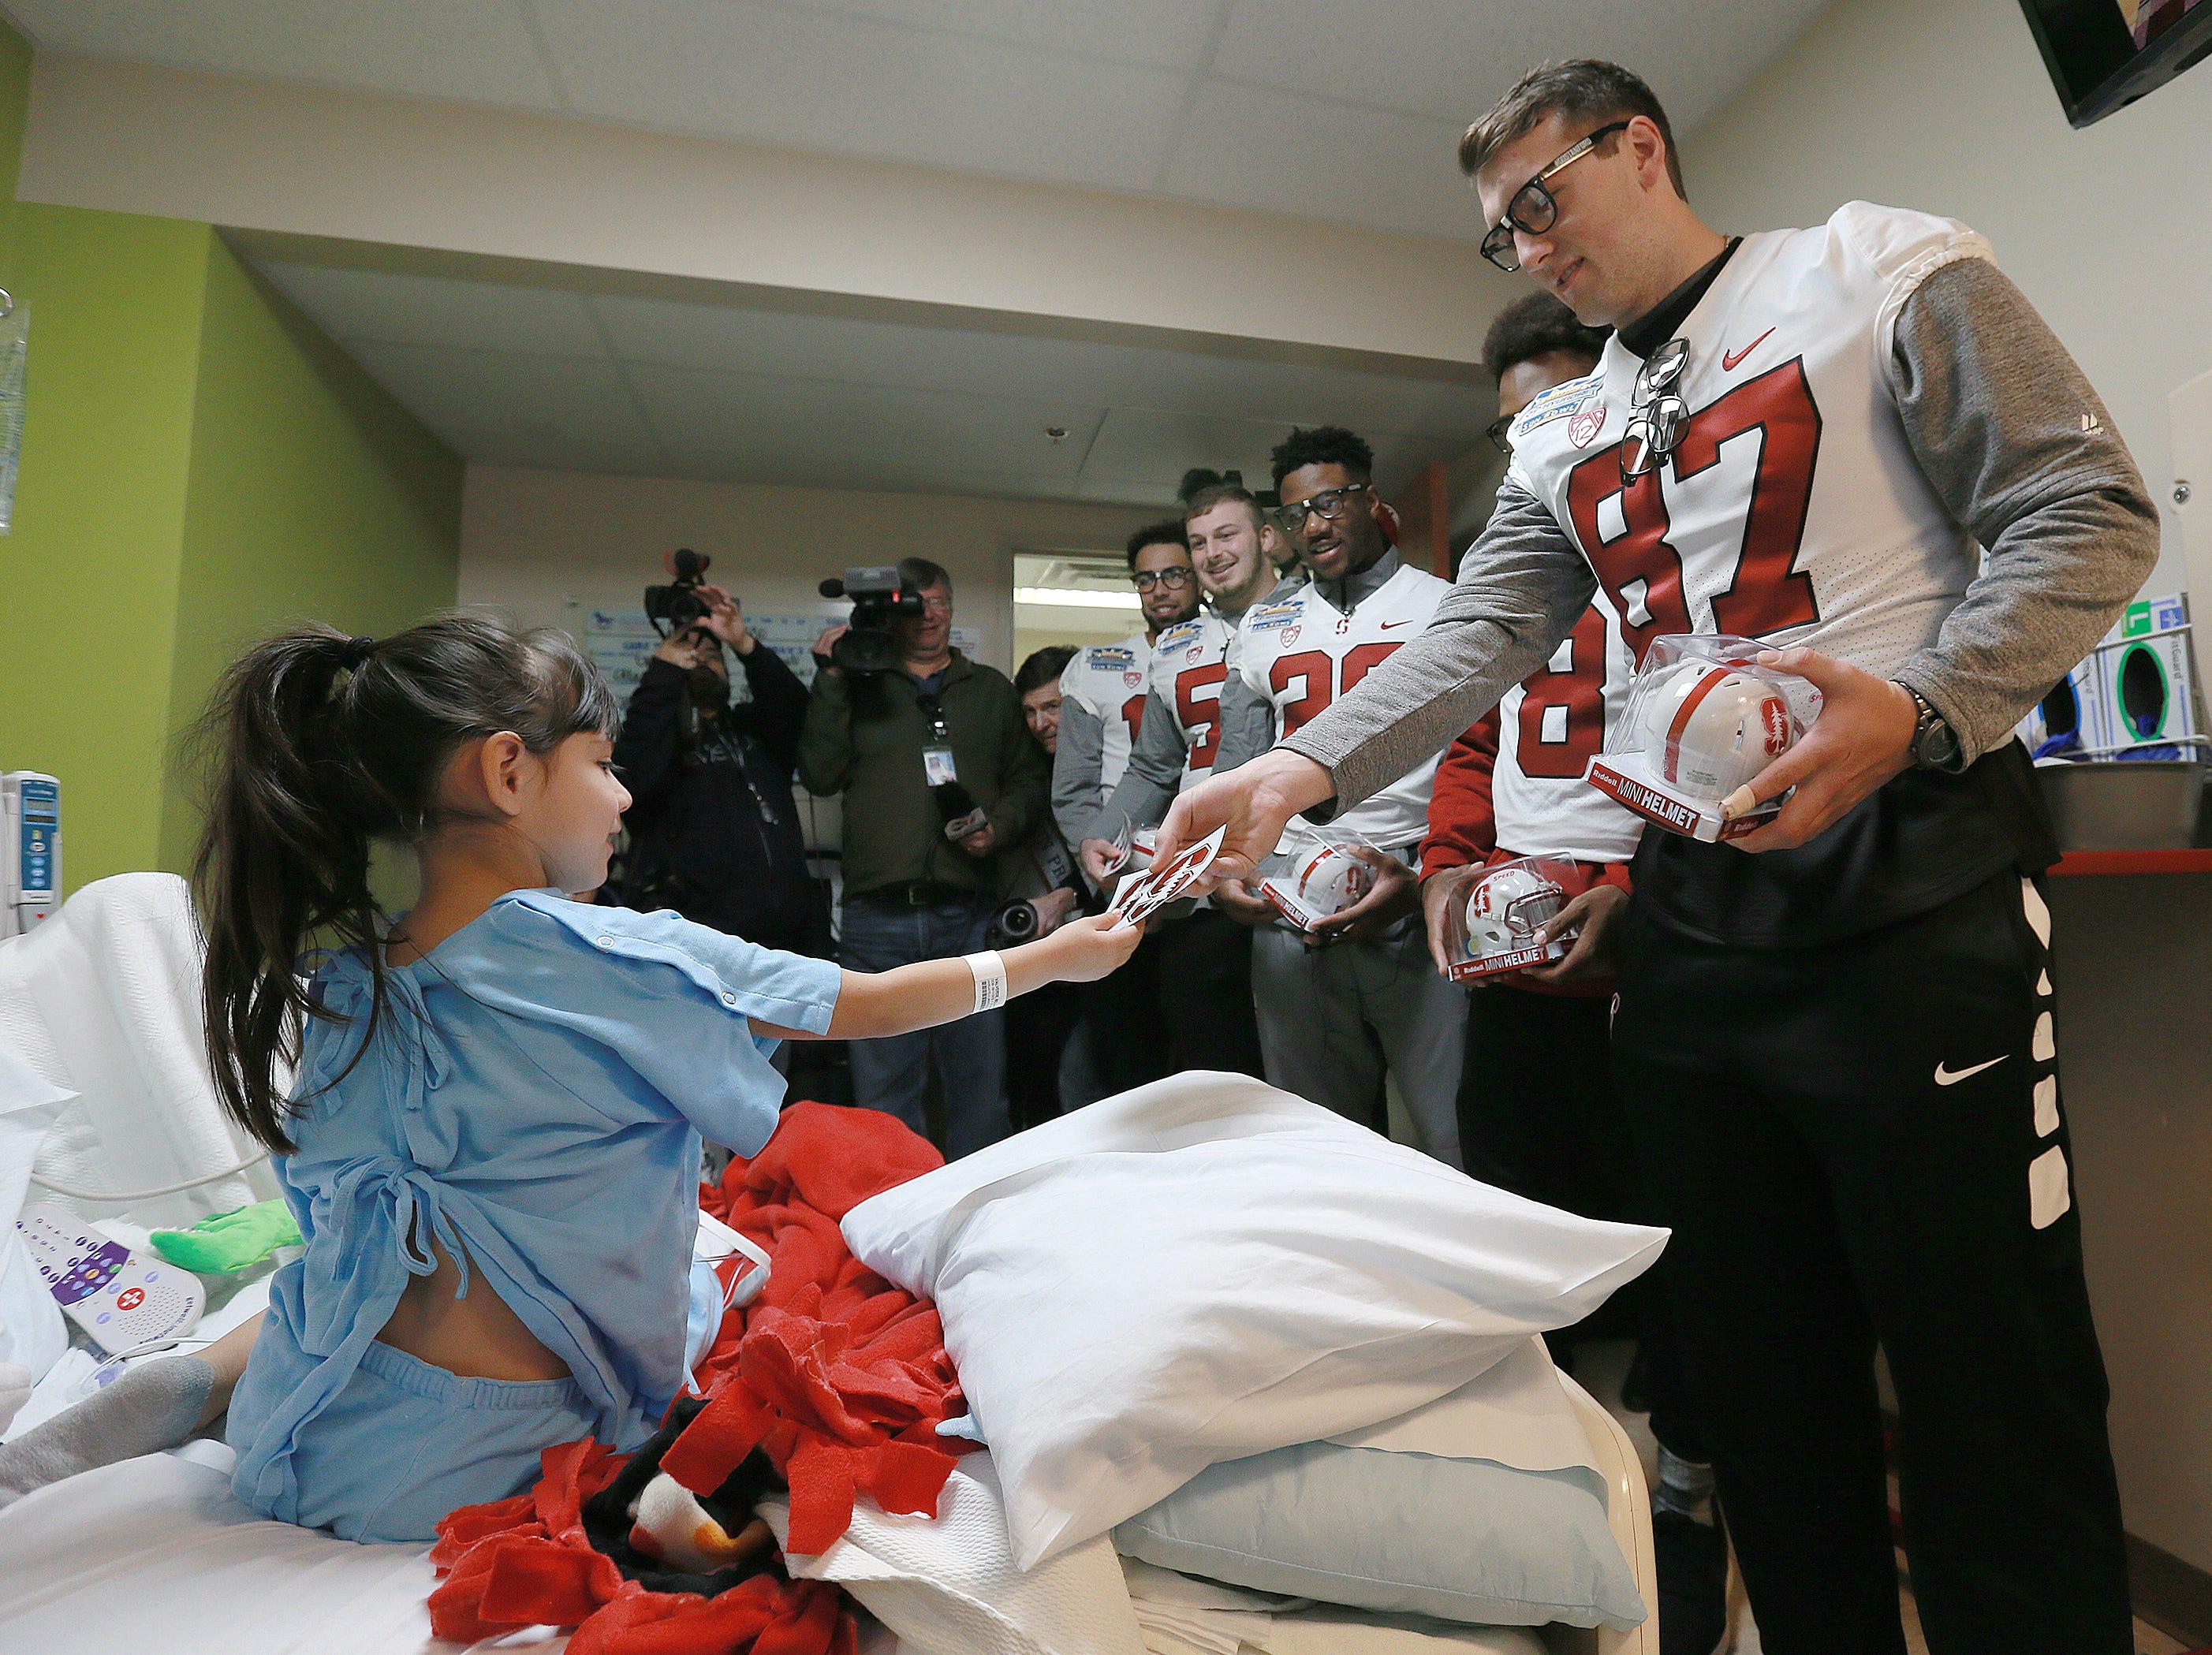 Stanford senior fullback Ben Snyder hands Stanford stickers to Providence Children's Hospital patient Bella Valverde during the team's visit Sunday.